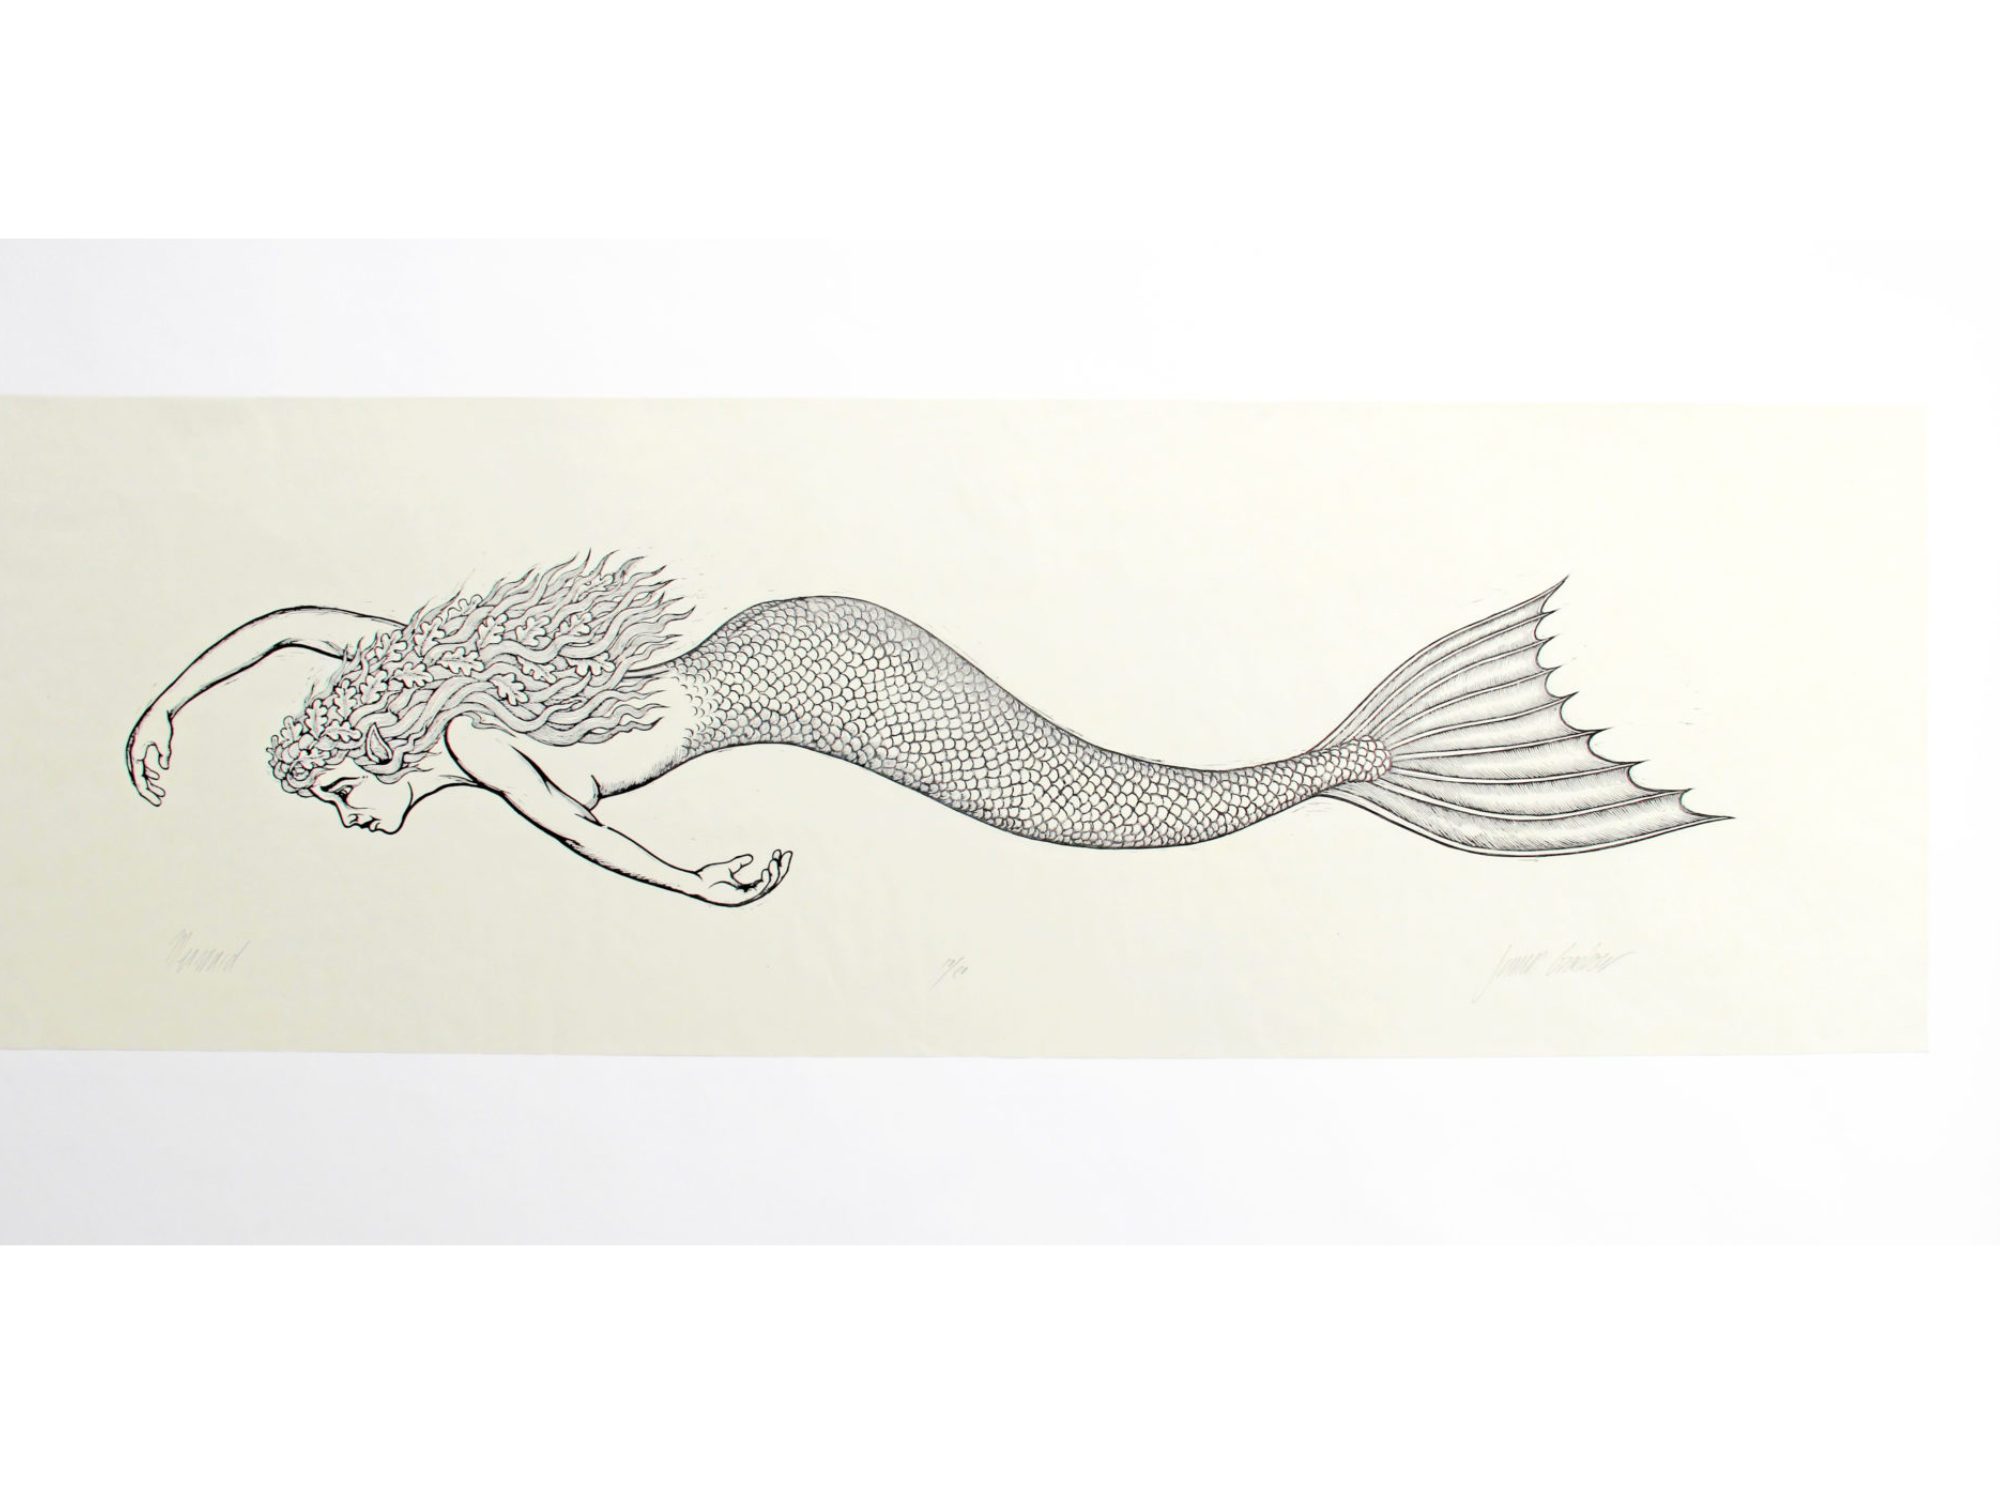 Woodcut print of a mermaid